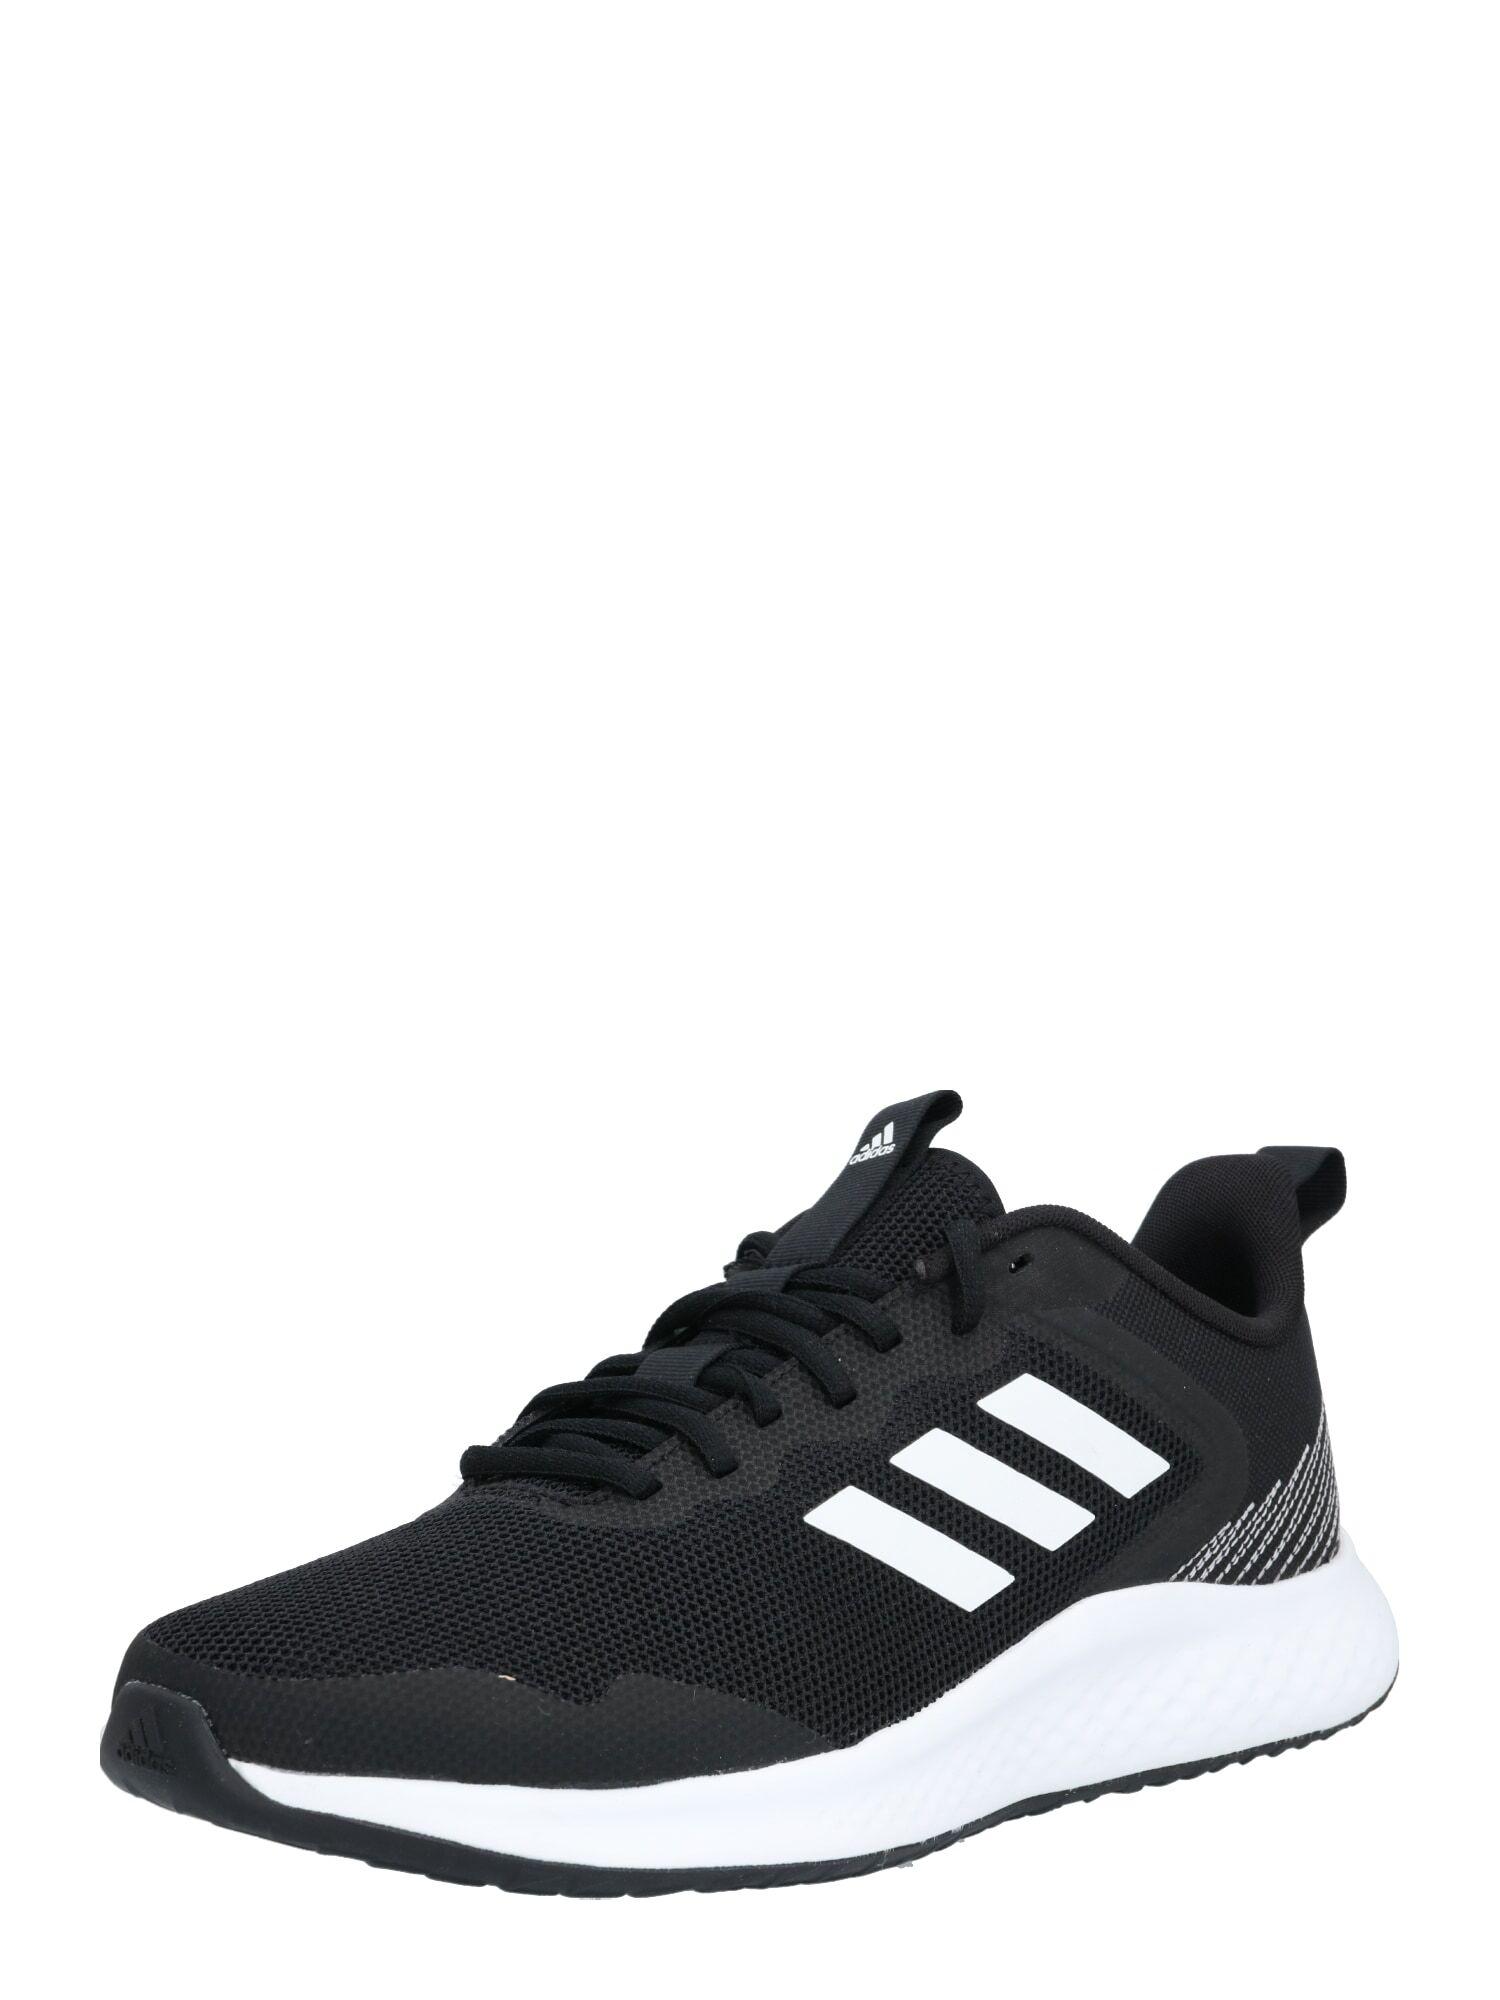 ADIDAS PERFORMANCE Chaussure de course 'Fluid Street'  - Noir - Taille: 10 - male